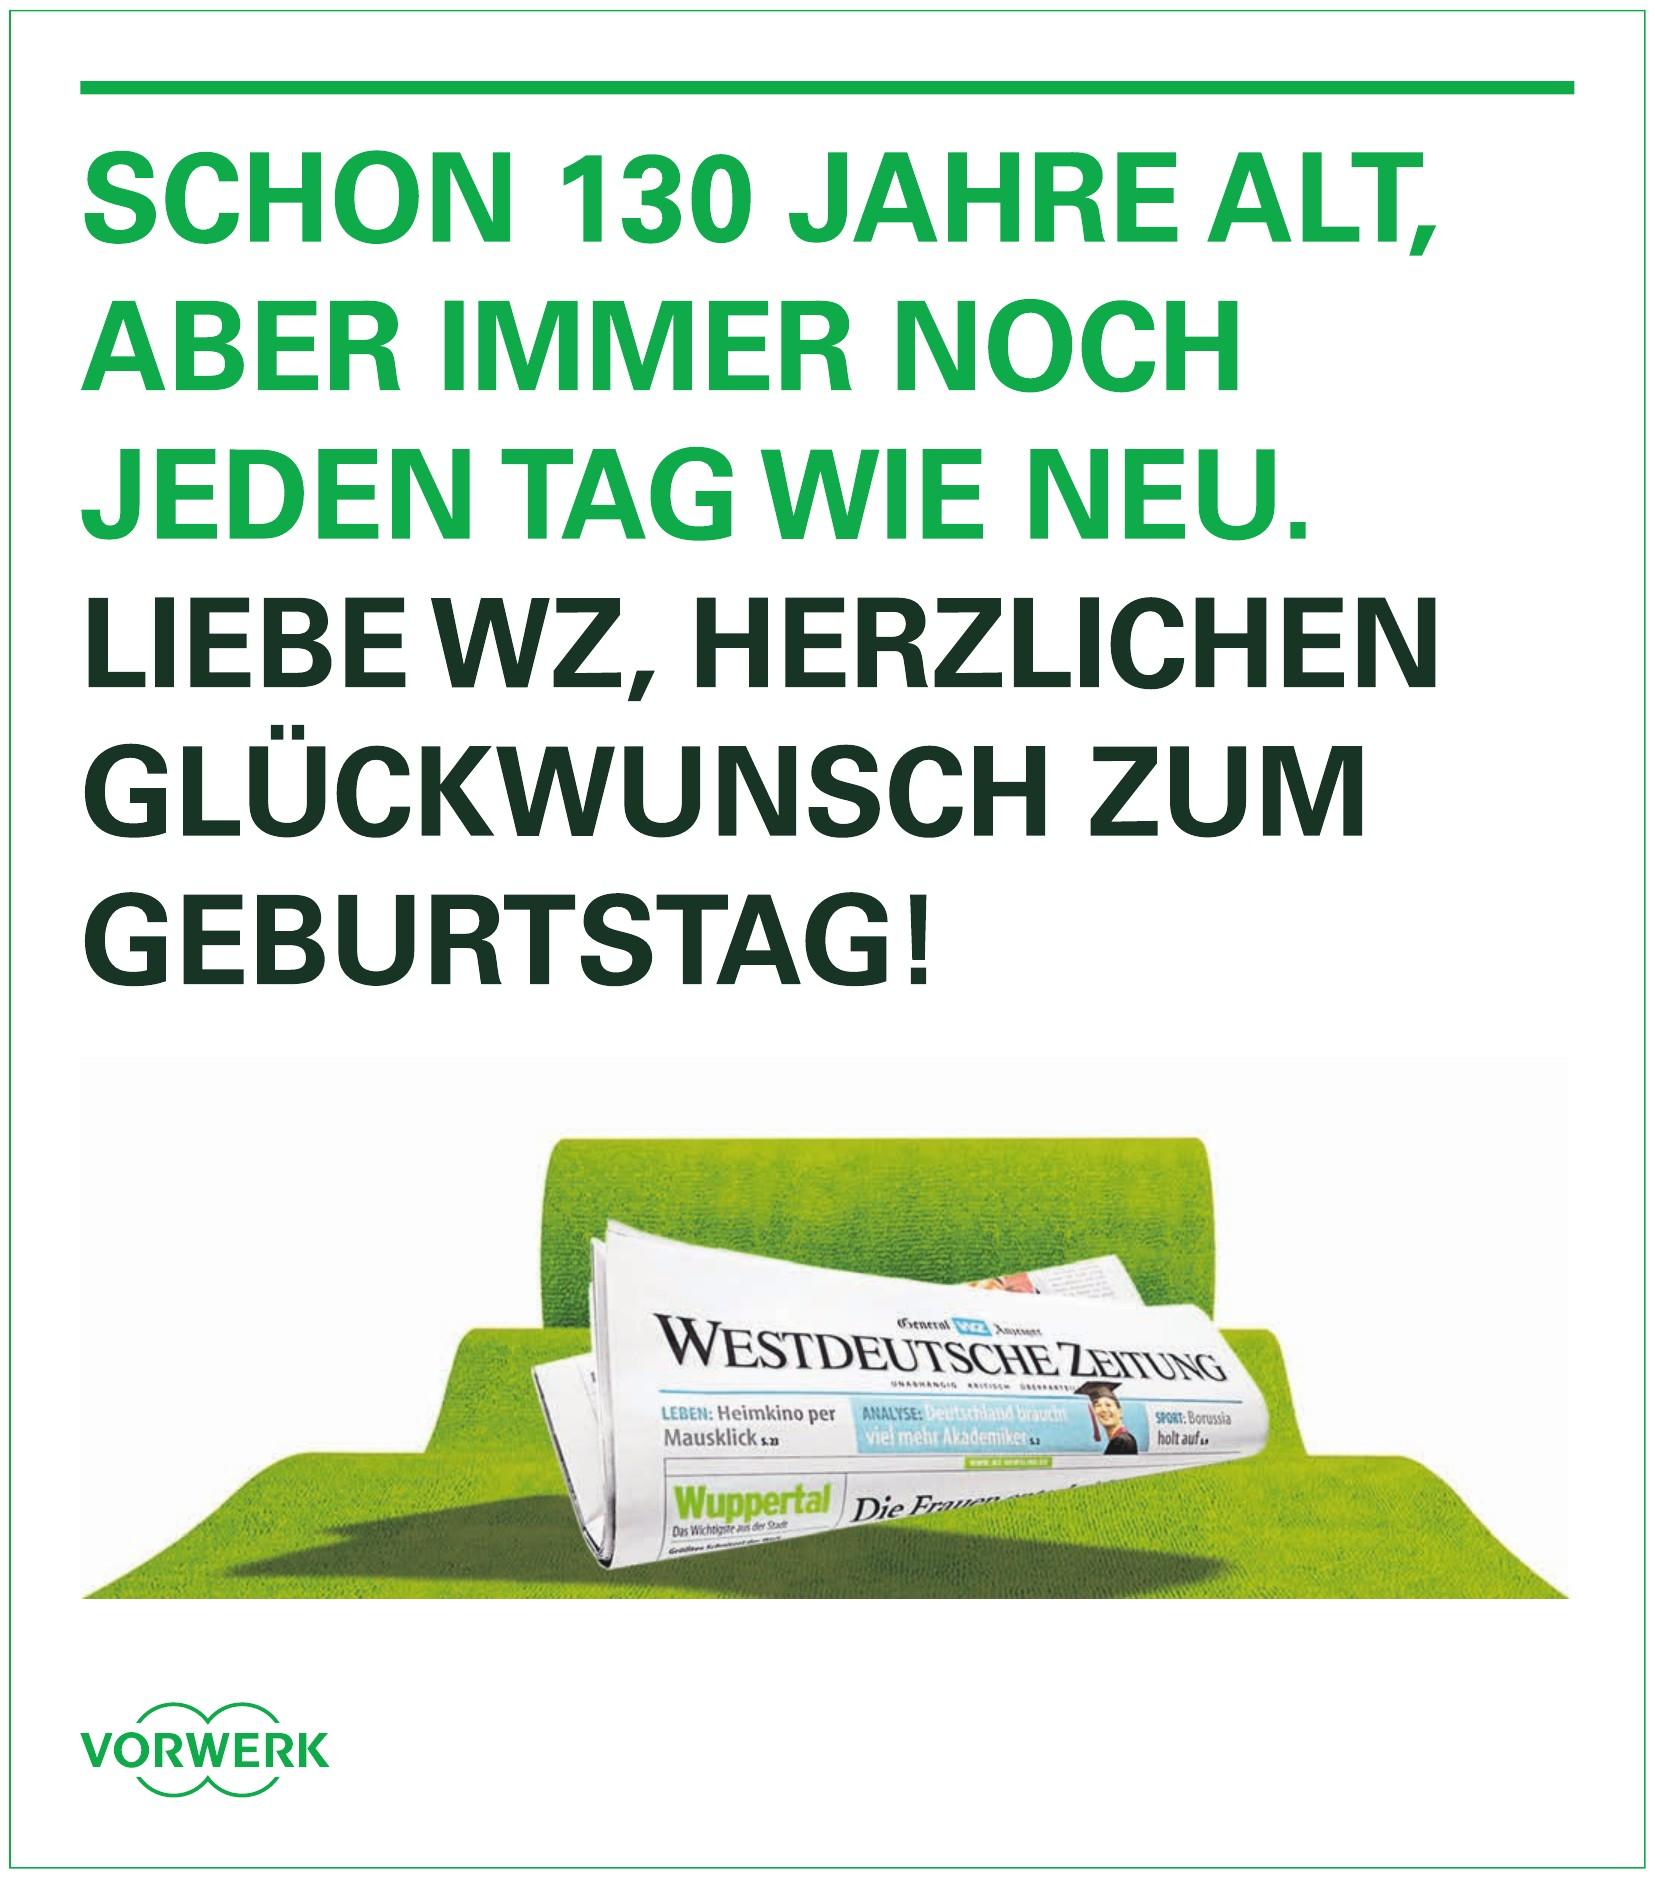 Wuppertal Bayer